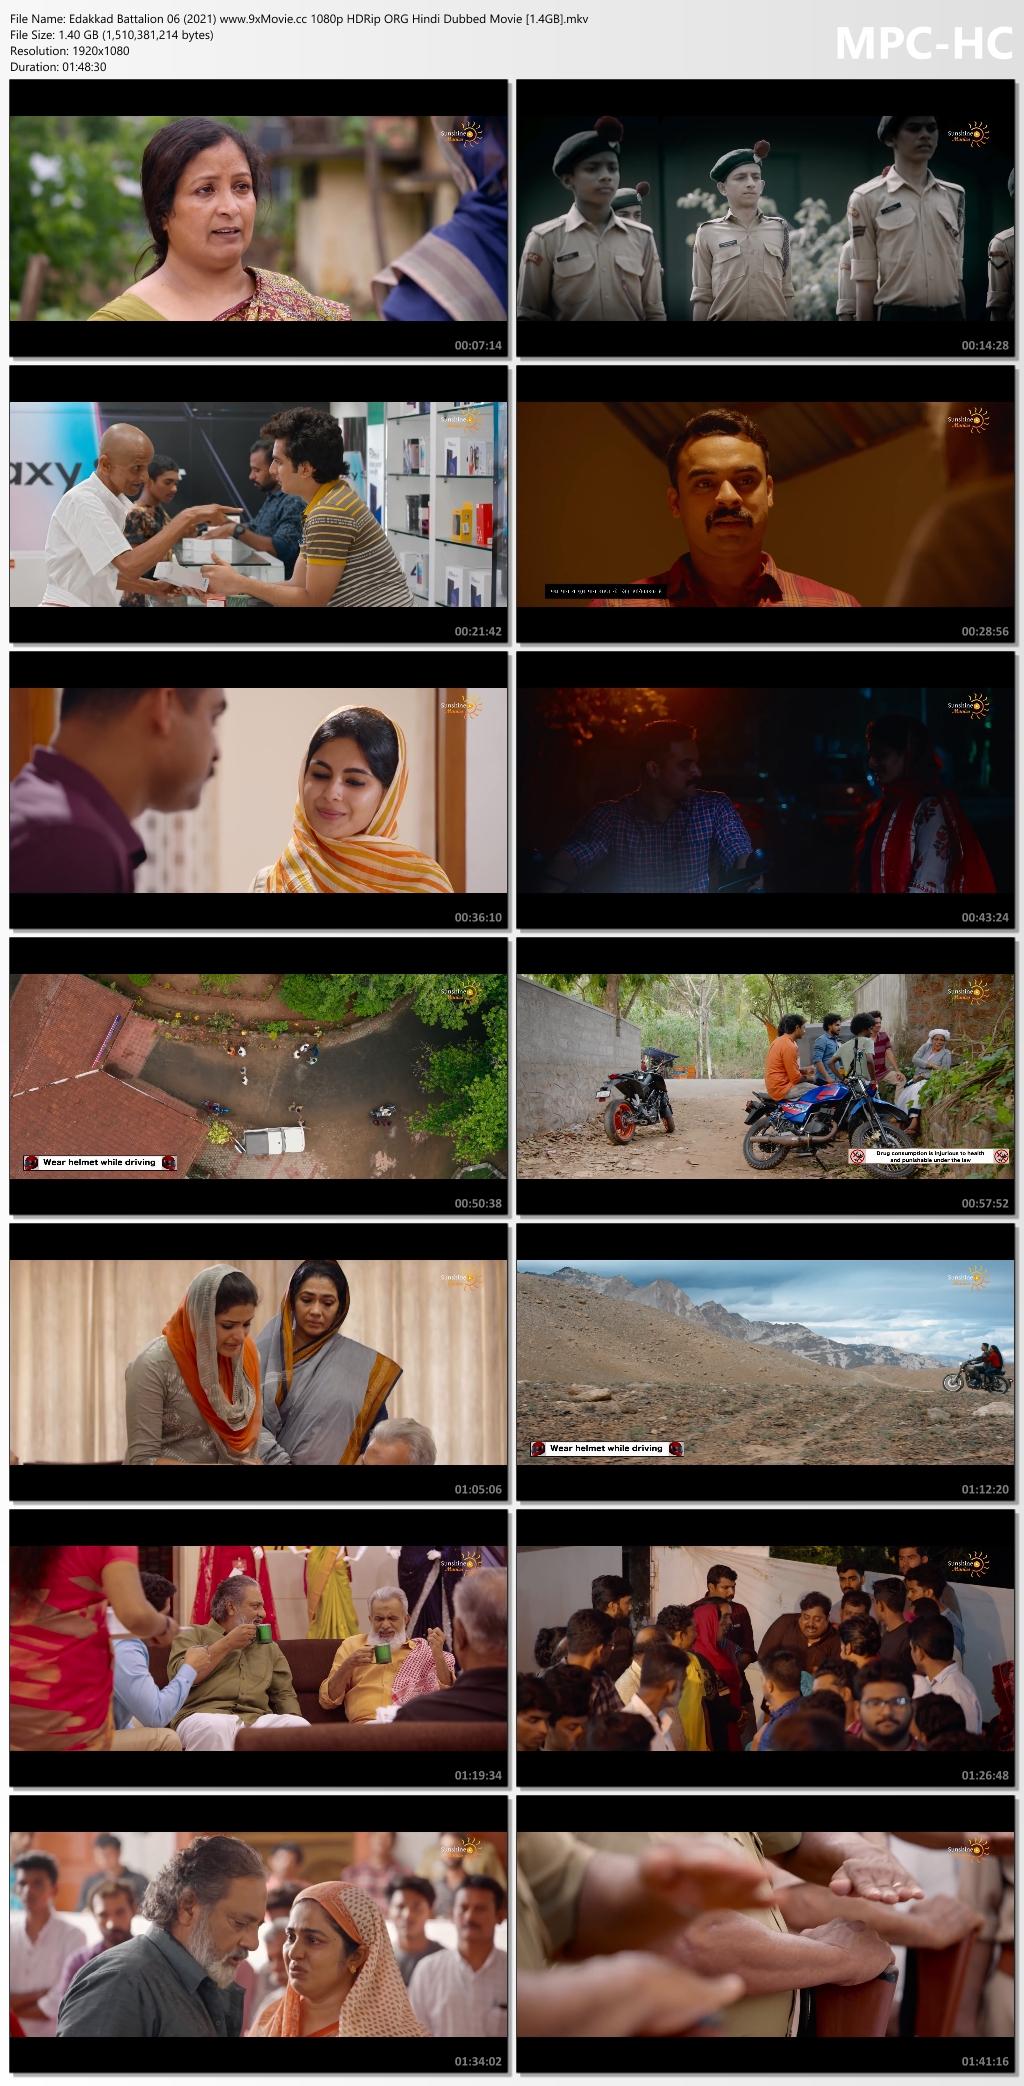 Edakkad-Battalion-06-2021-www-9x-Movie-cc-1080p-HDRip-ORG-Hindi-Dubbed-Movie-1-4-GB-mkv